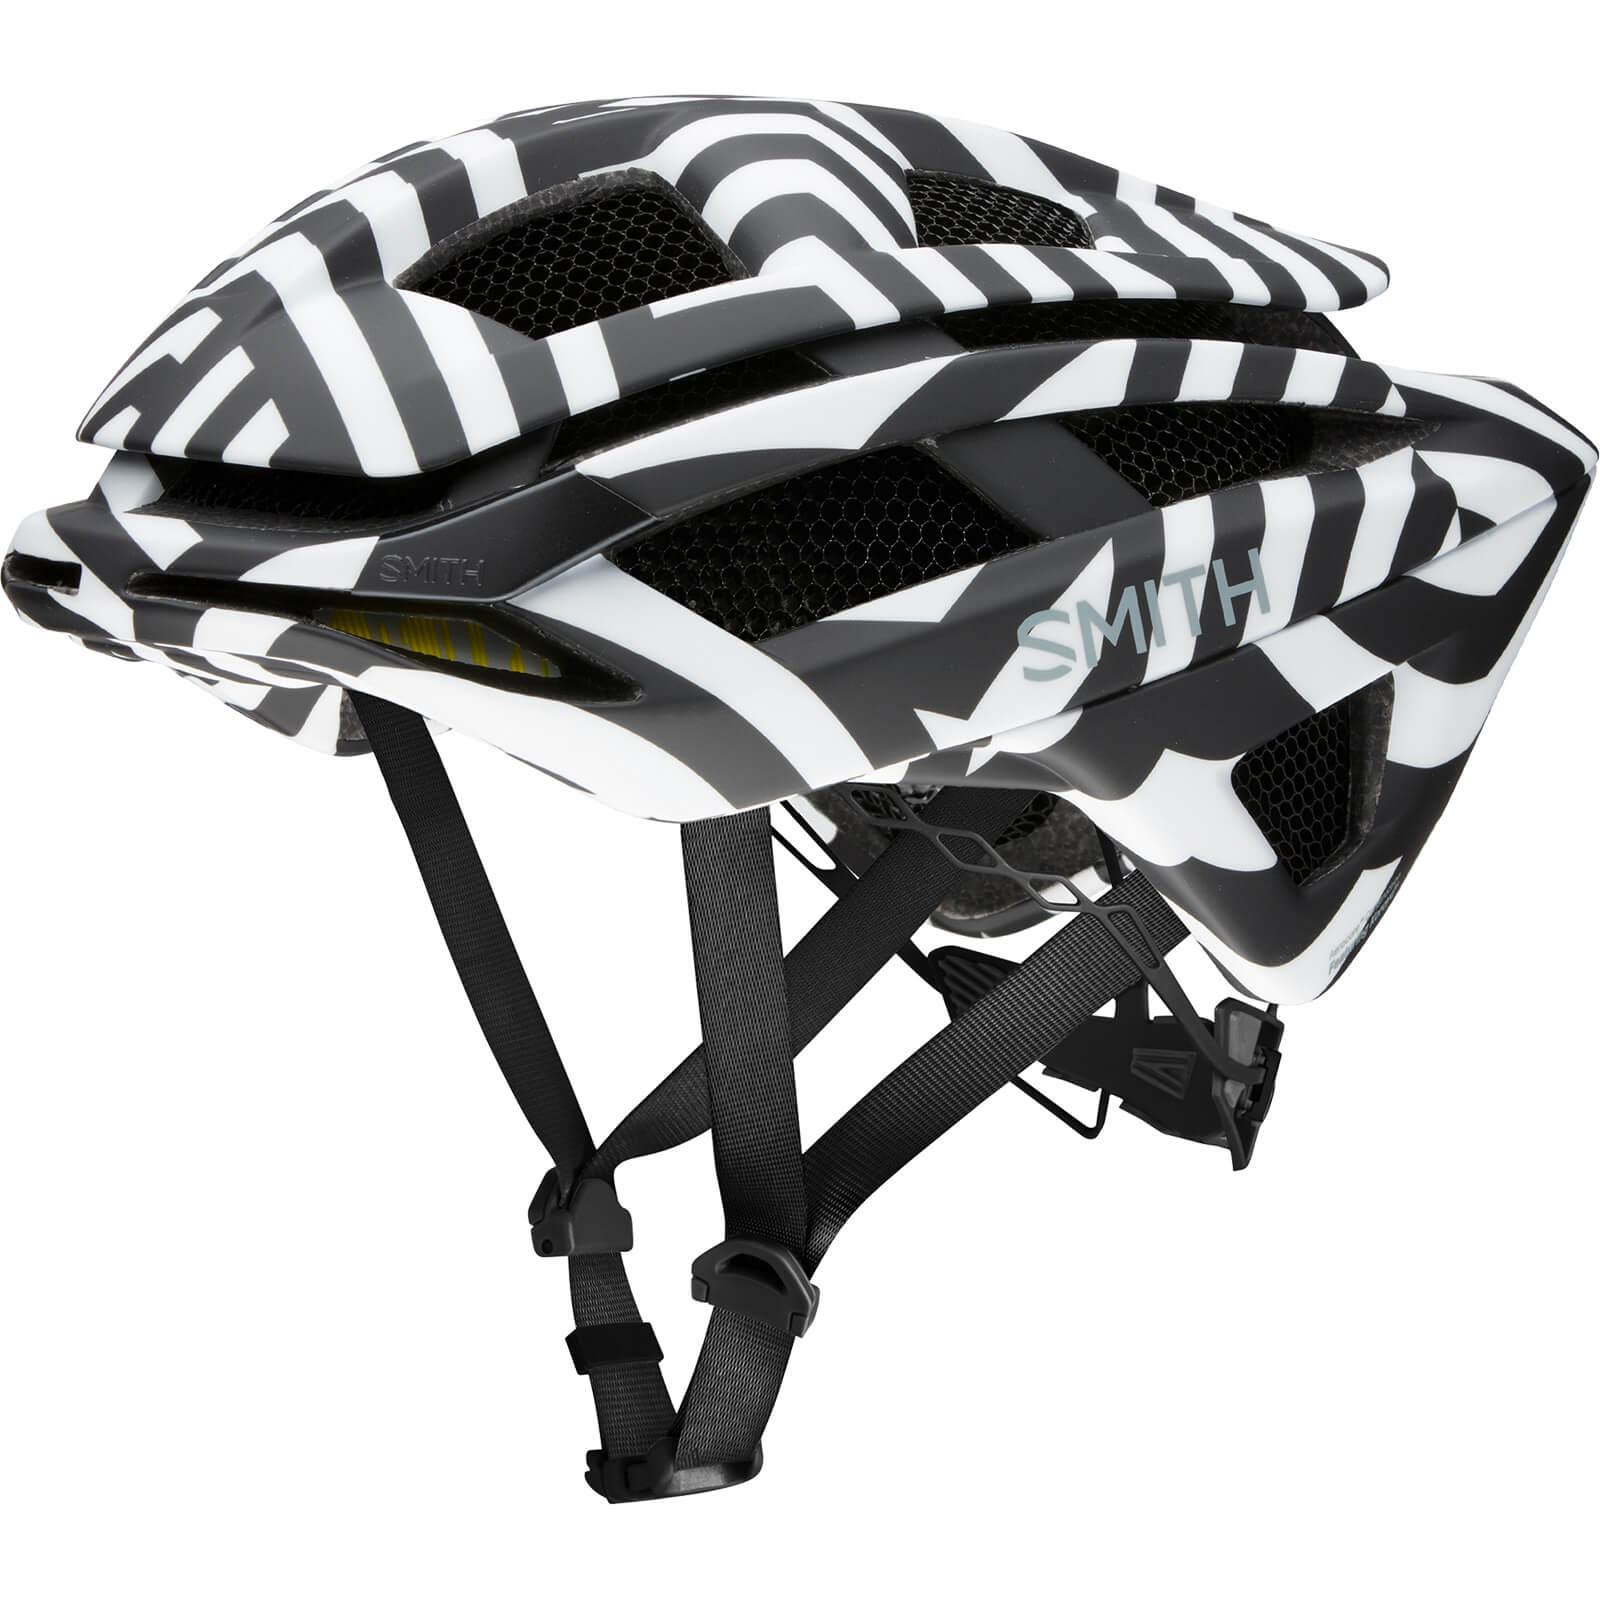 Smith Overtake MIPS Bicycle Helmet - L/59-62cm - Black/White